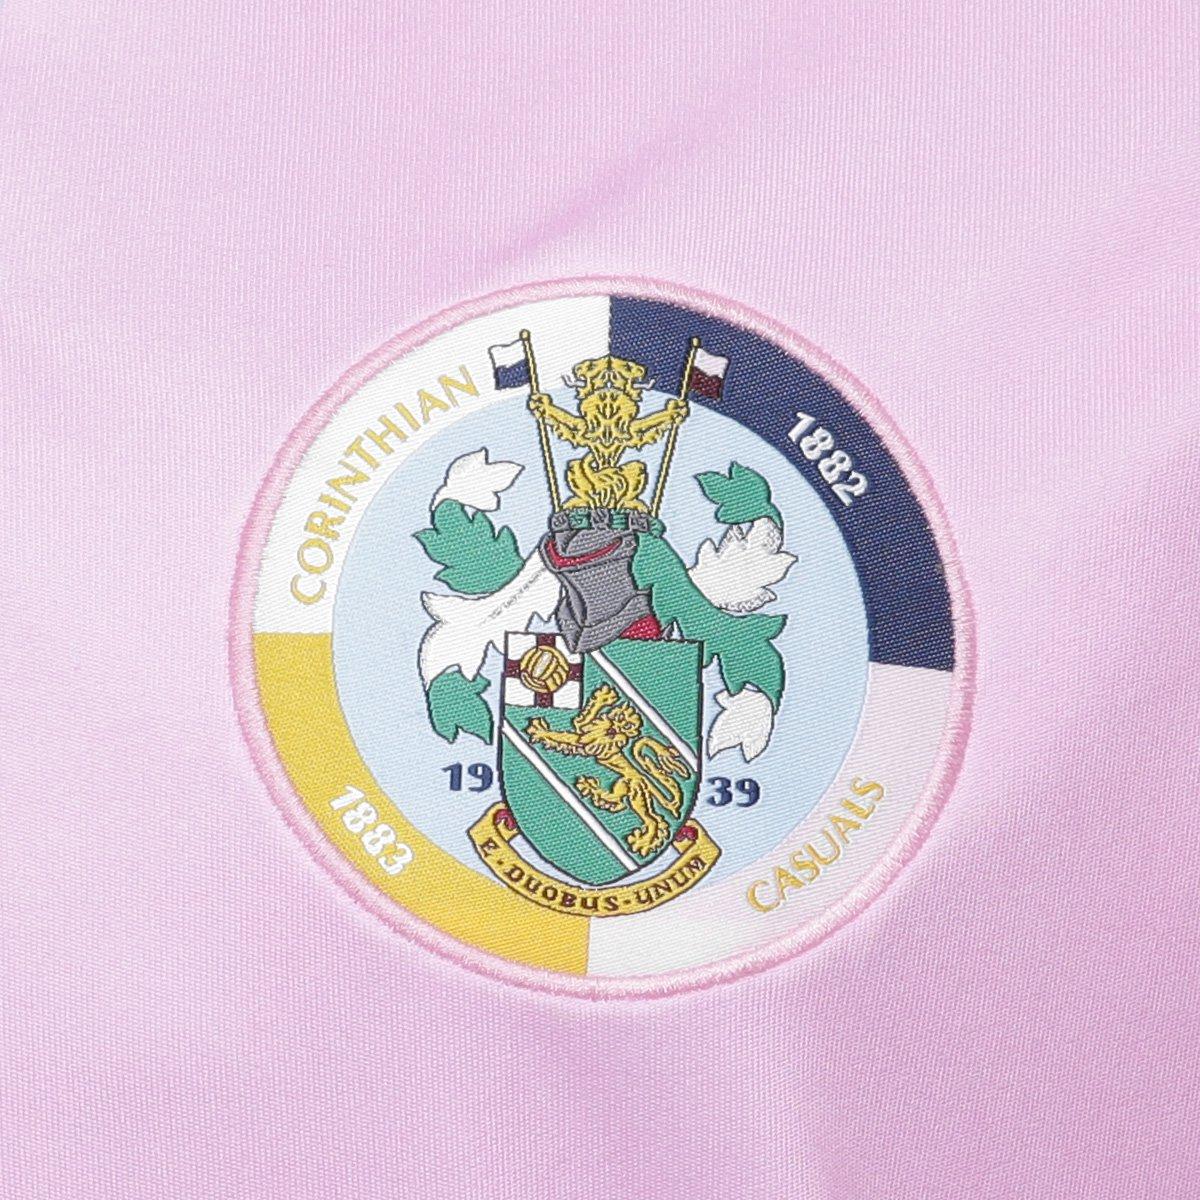 Camisa Corinthian Casuals Home 17 18 Torcedor - Masculina - Marrom e ... a19af490ce705